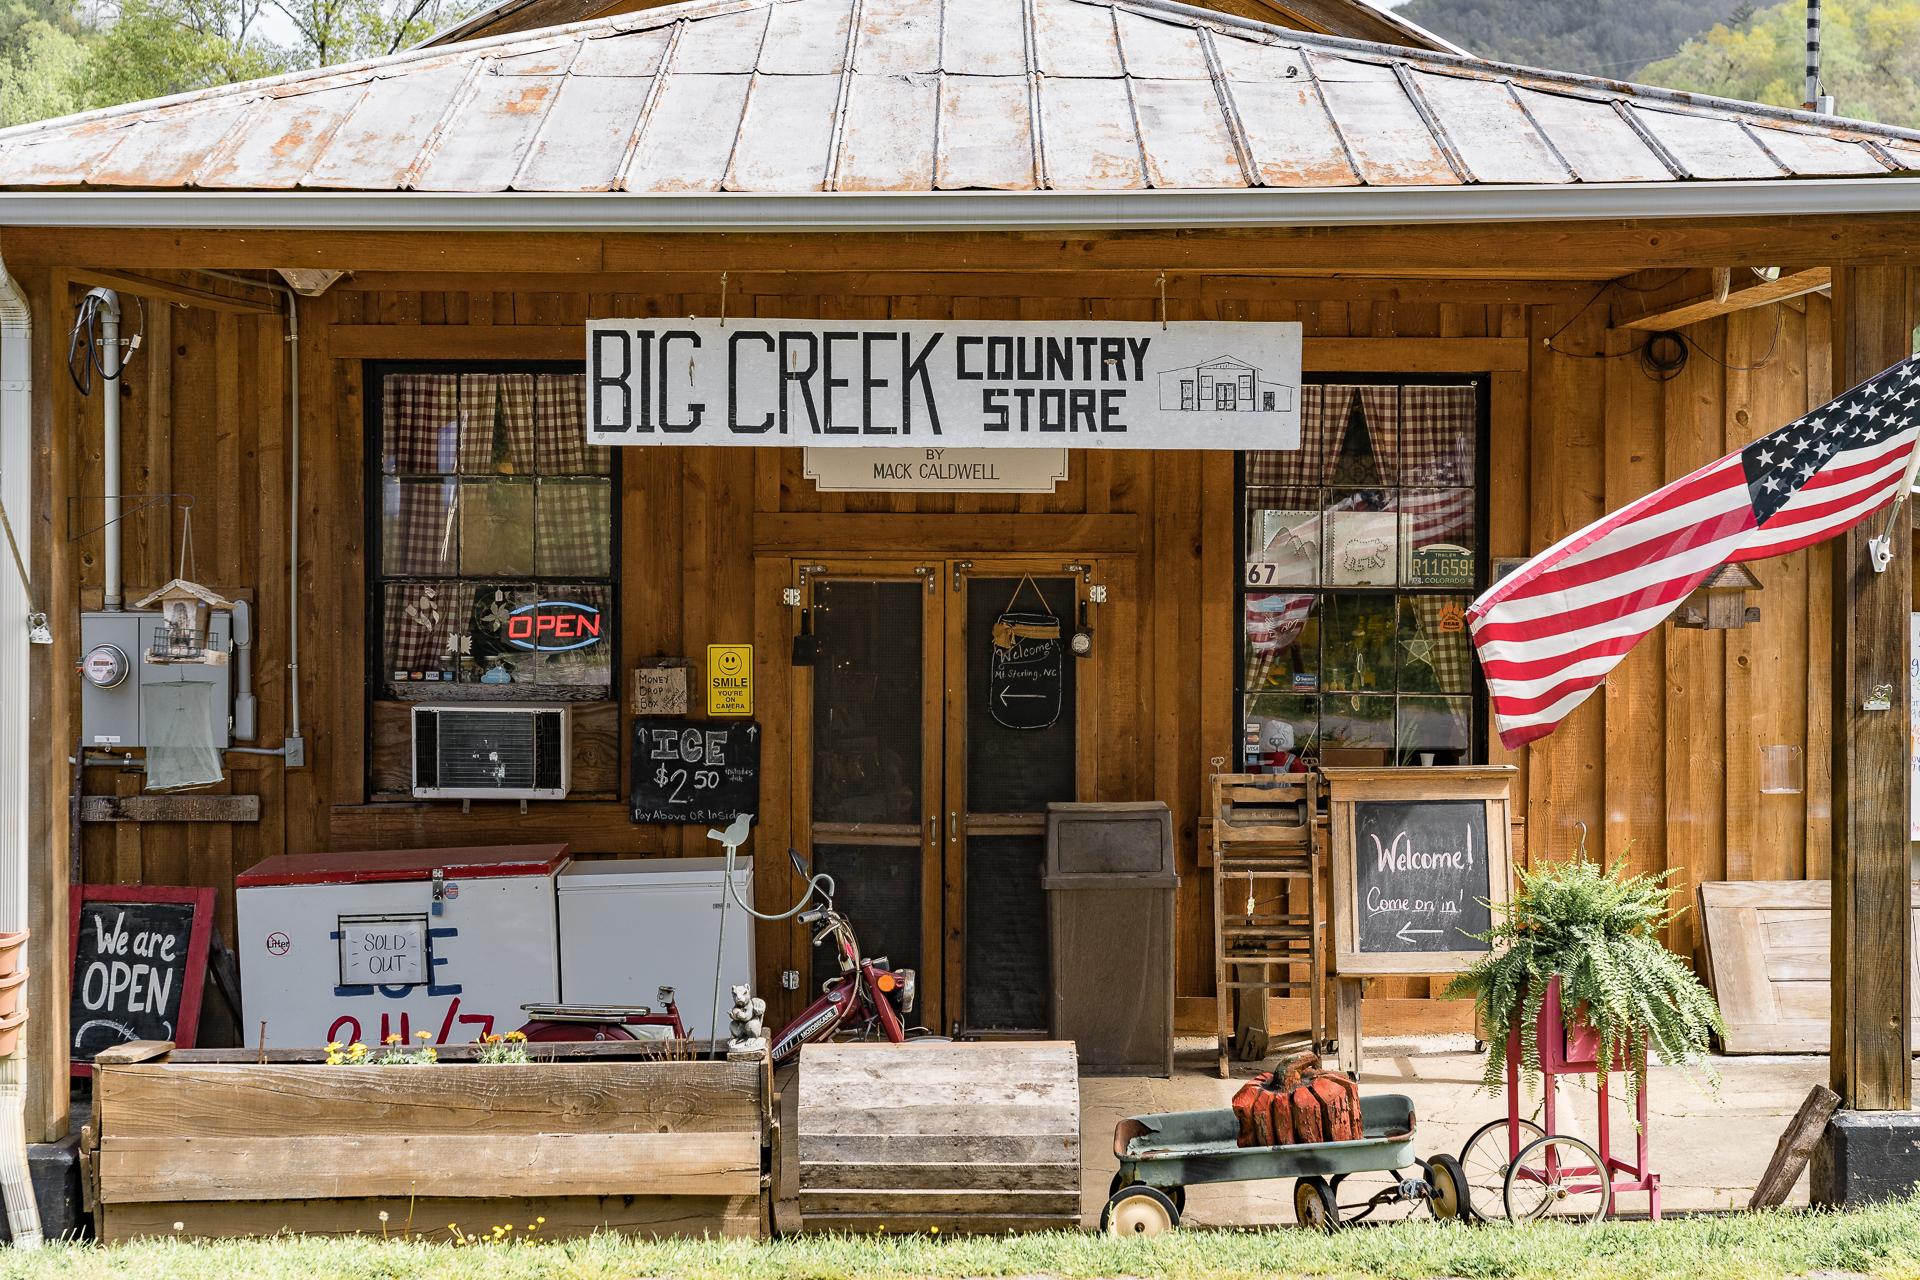 big-creek-gsmnp-great-smoky-mountains-national-park-Kathleen-Kathy-Roberts-Asheville-NC-Photographer-1.jpg